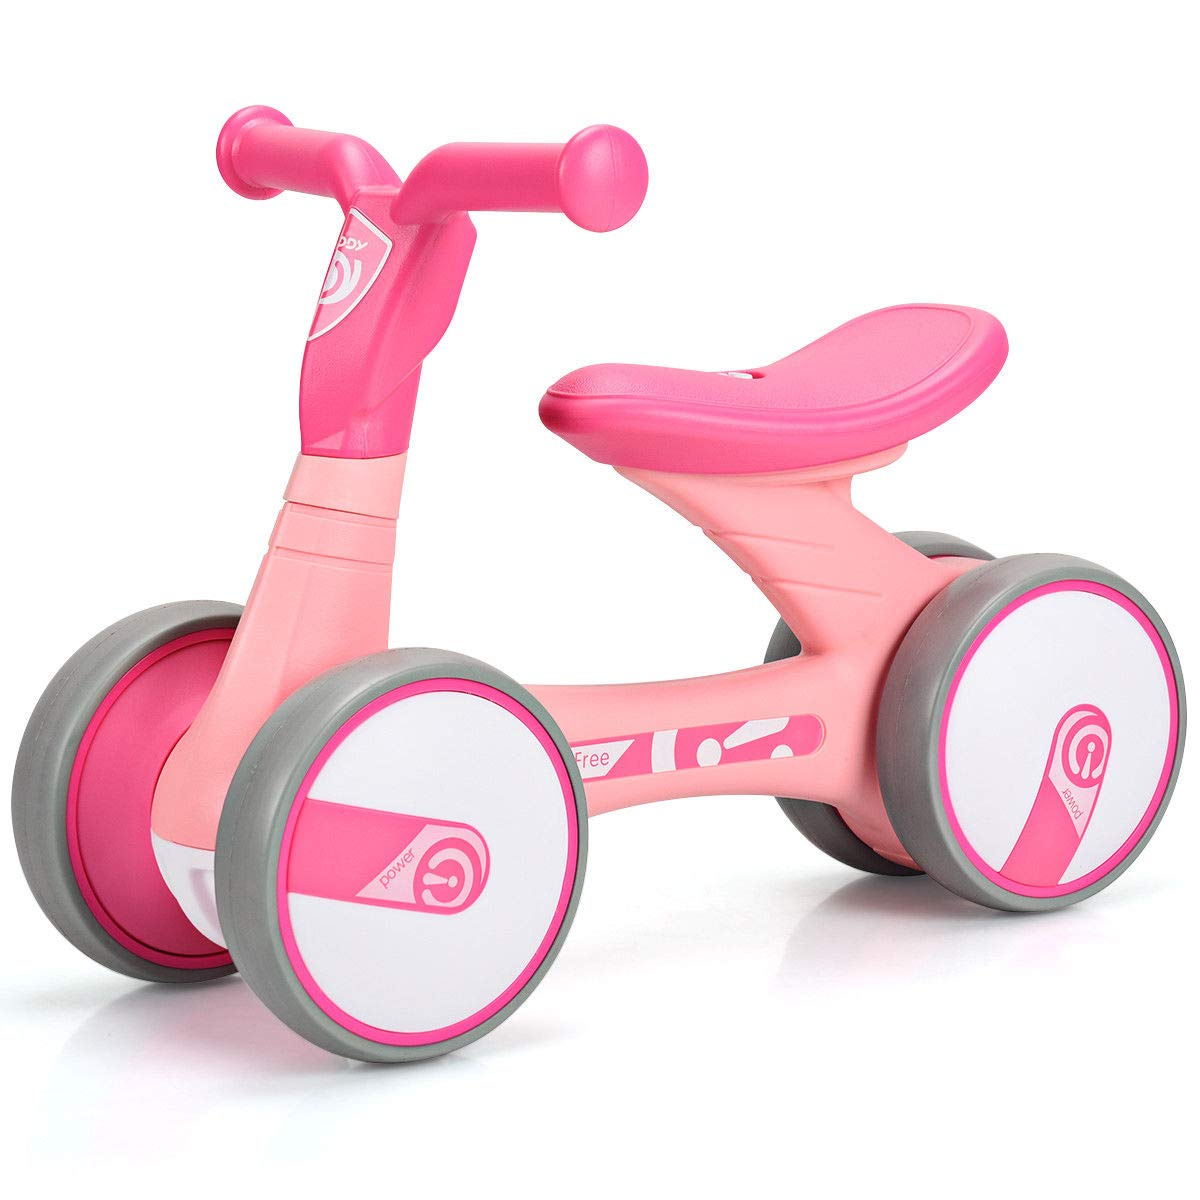 Costzon Baby Balance Bikes, Mini Bike Bicycle, Children Walker Toys Rides for 18 Months No Pedal Infant 4 Wheels Toddler Bike